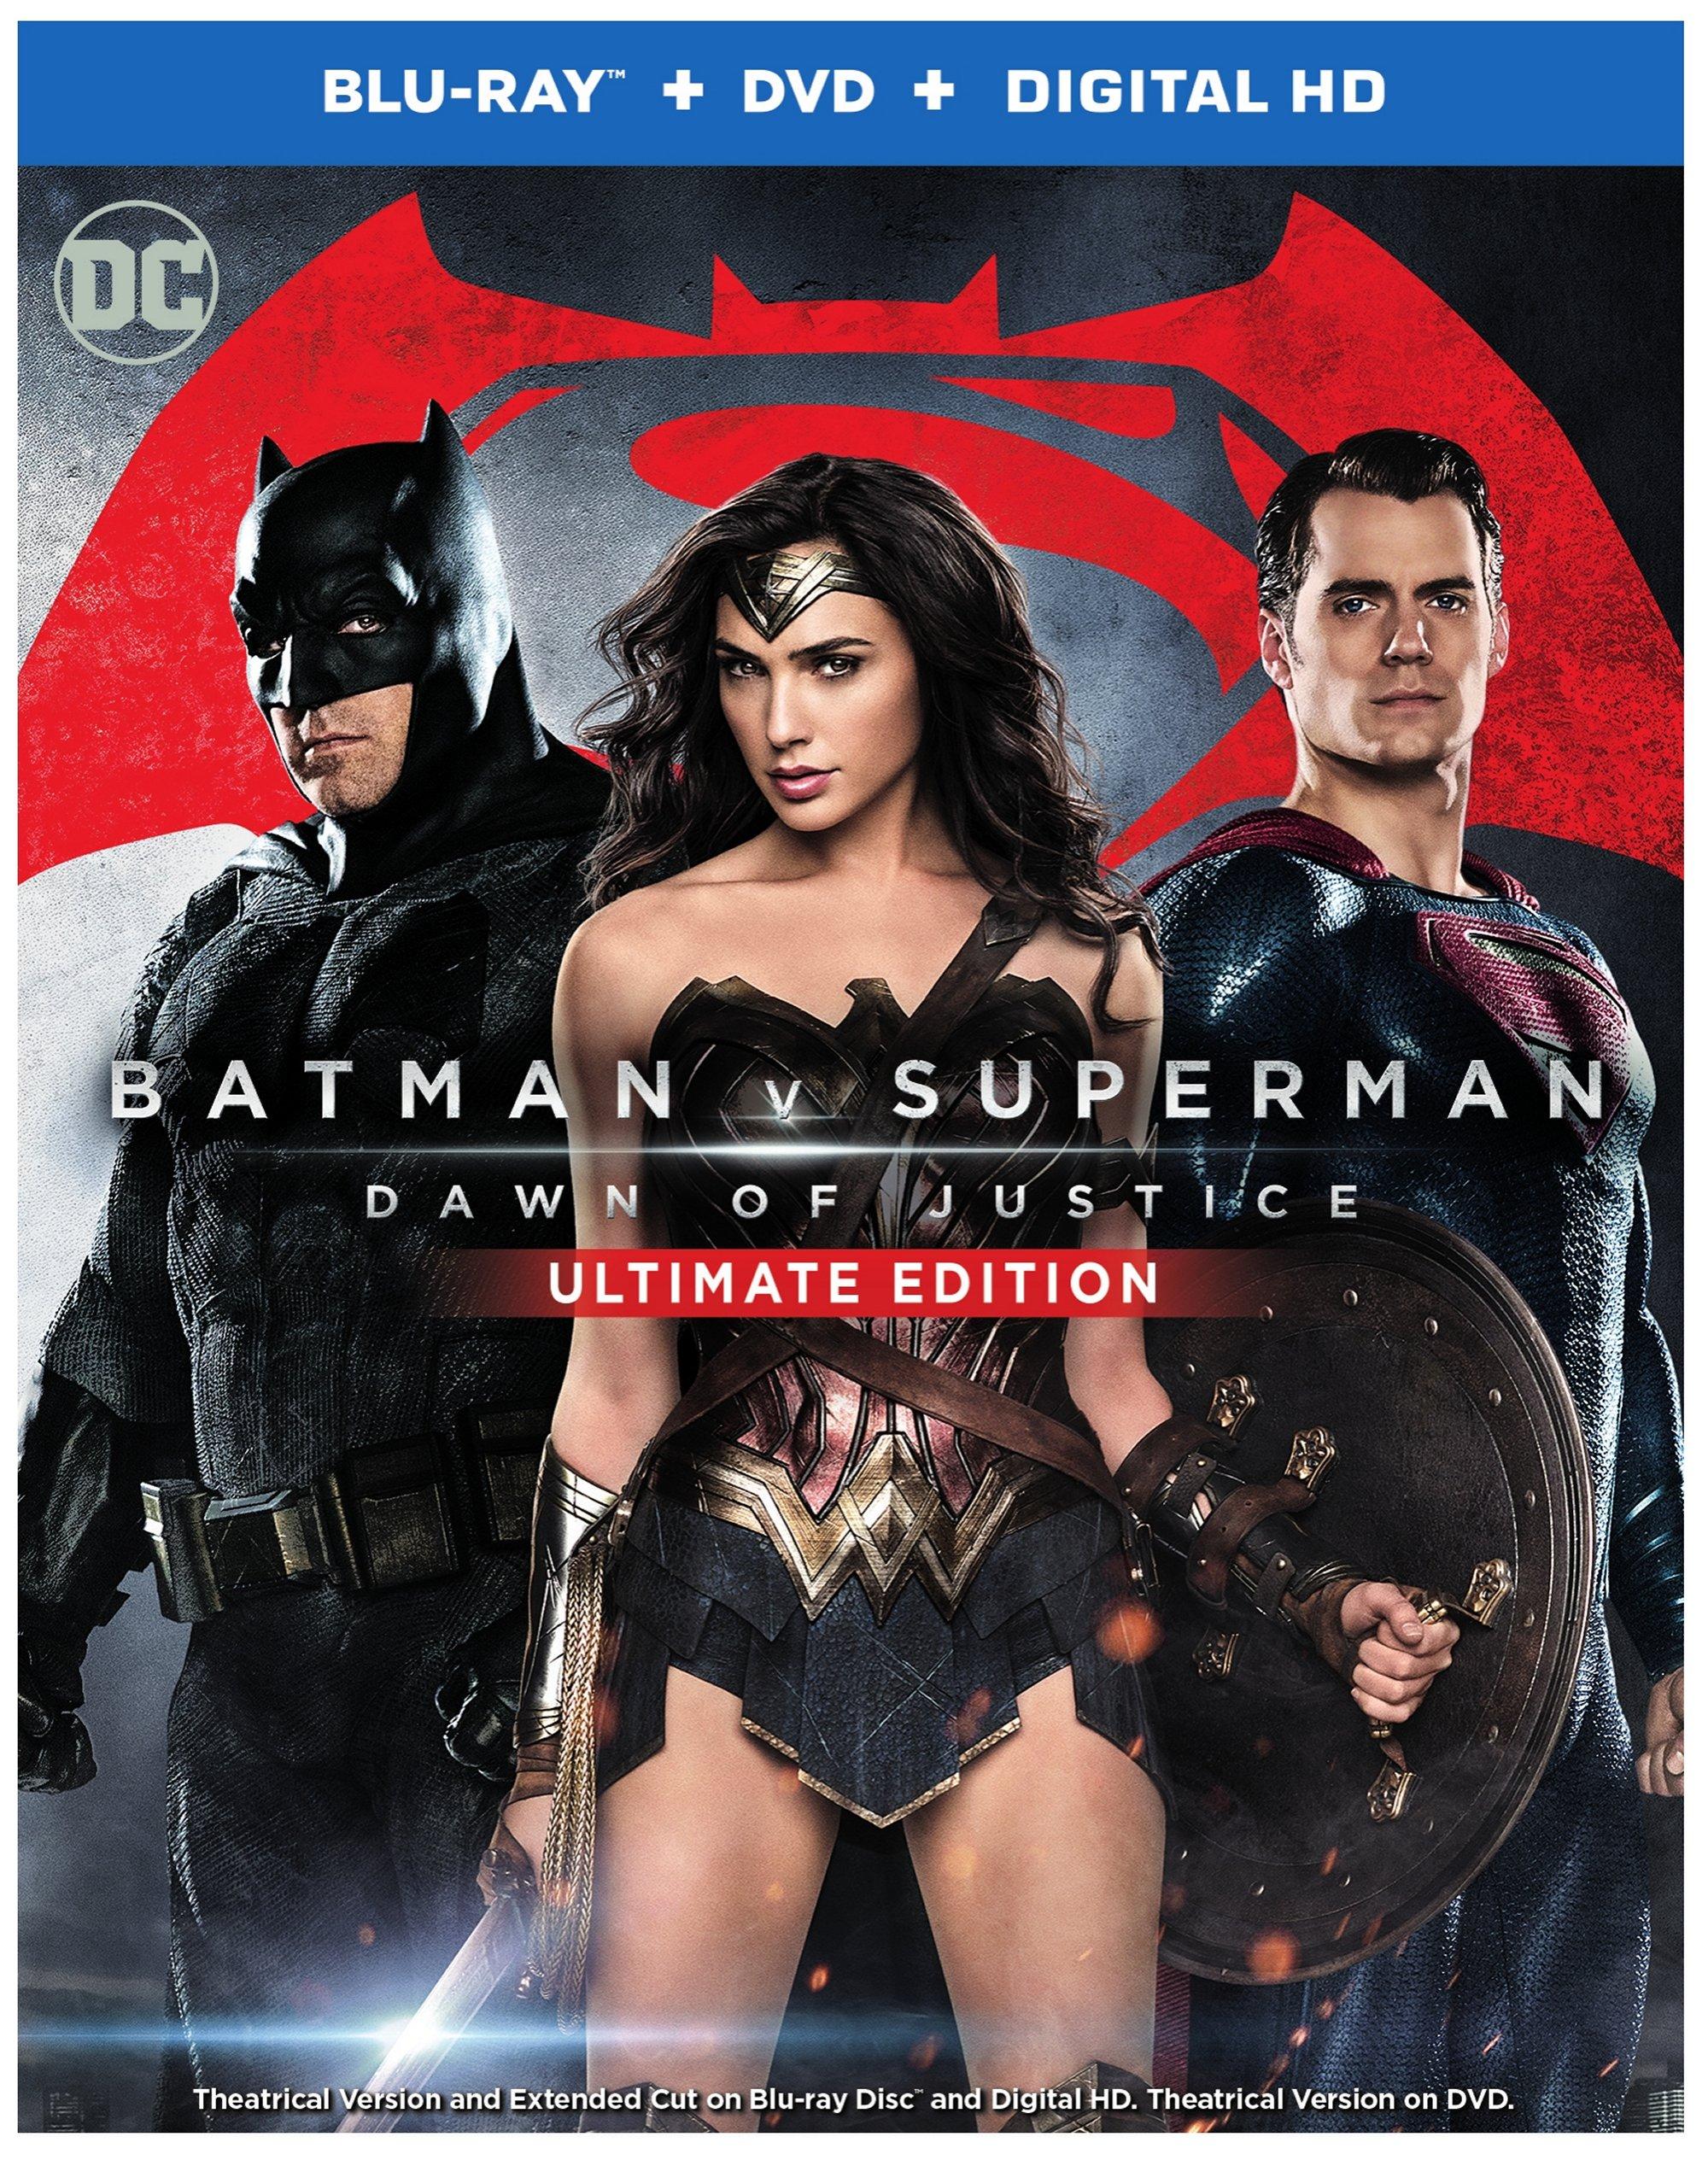 Batman v Superman DOJ Boxart 2D